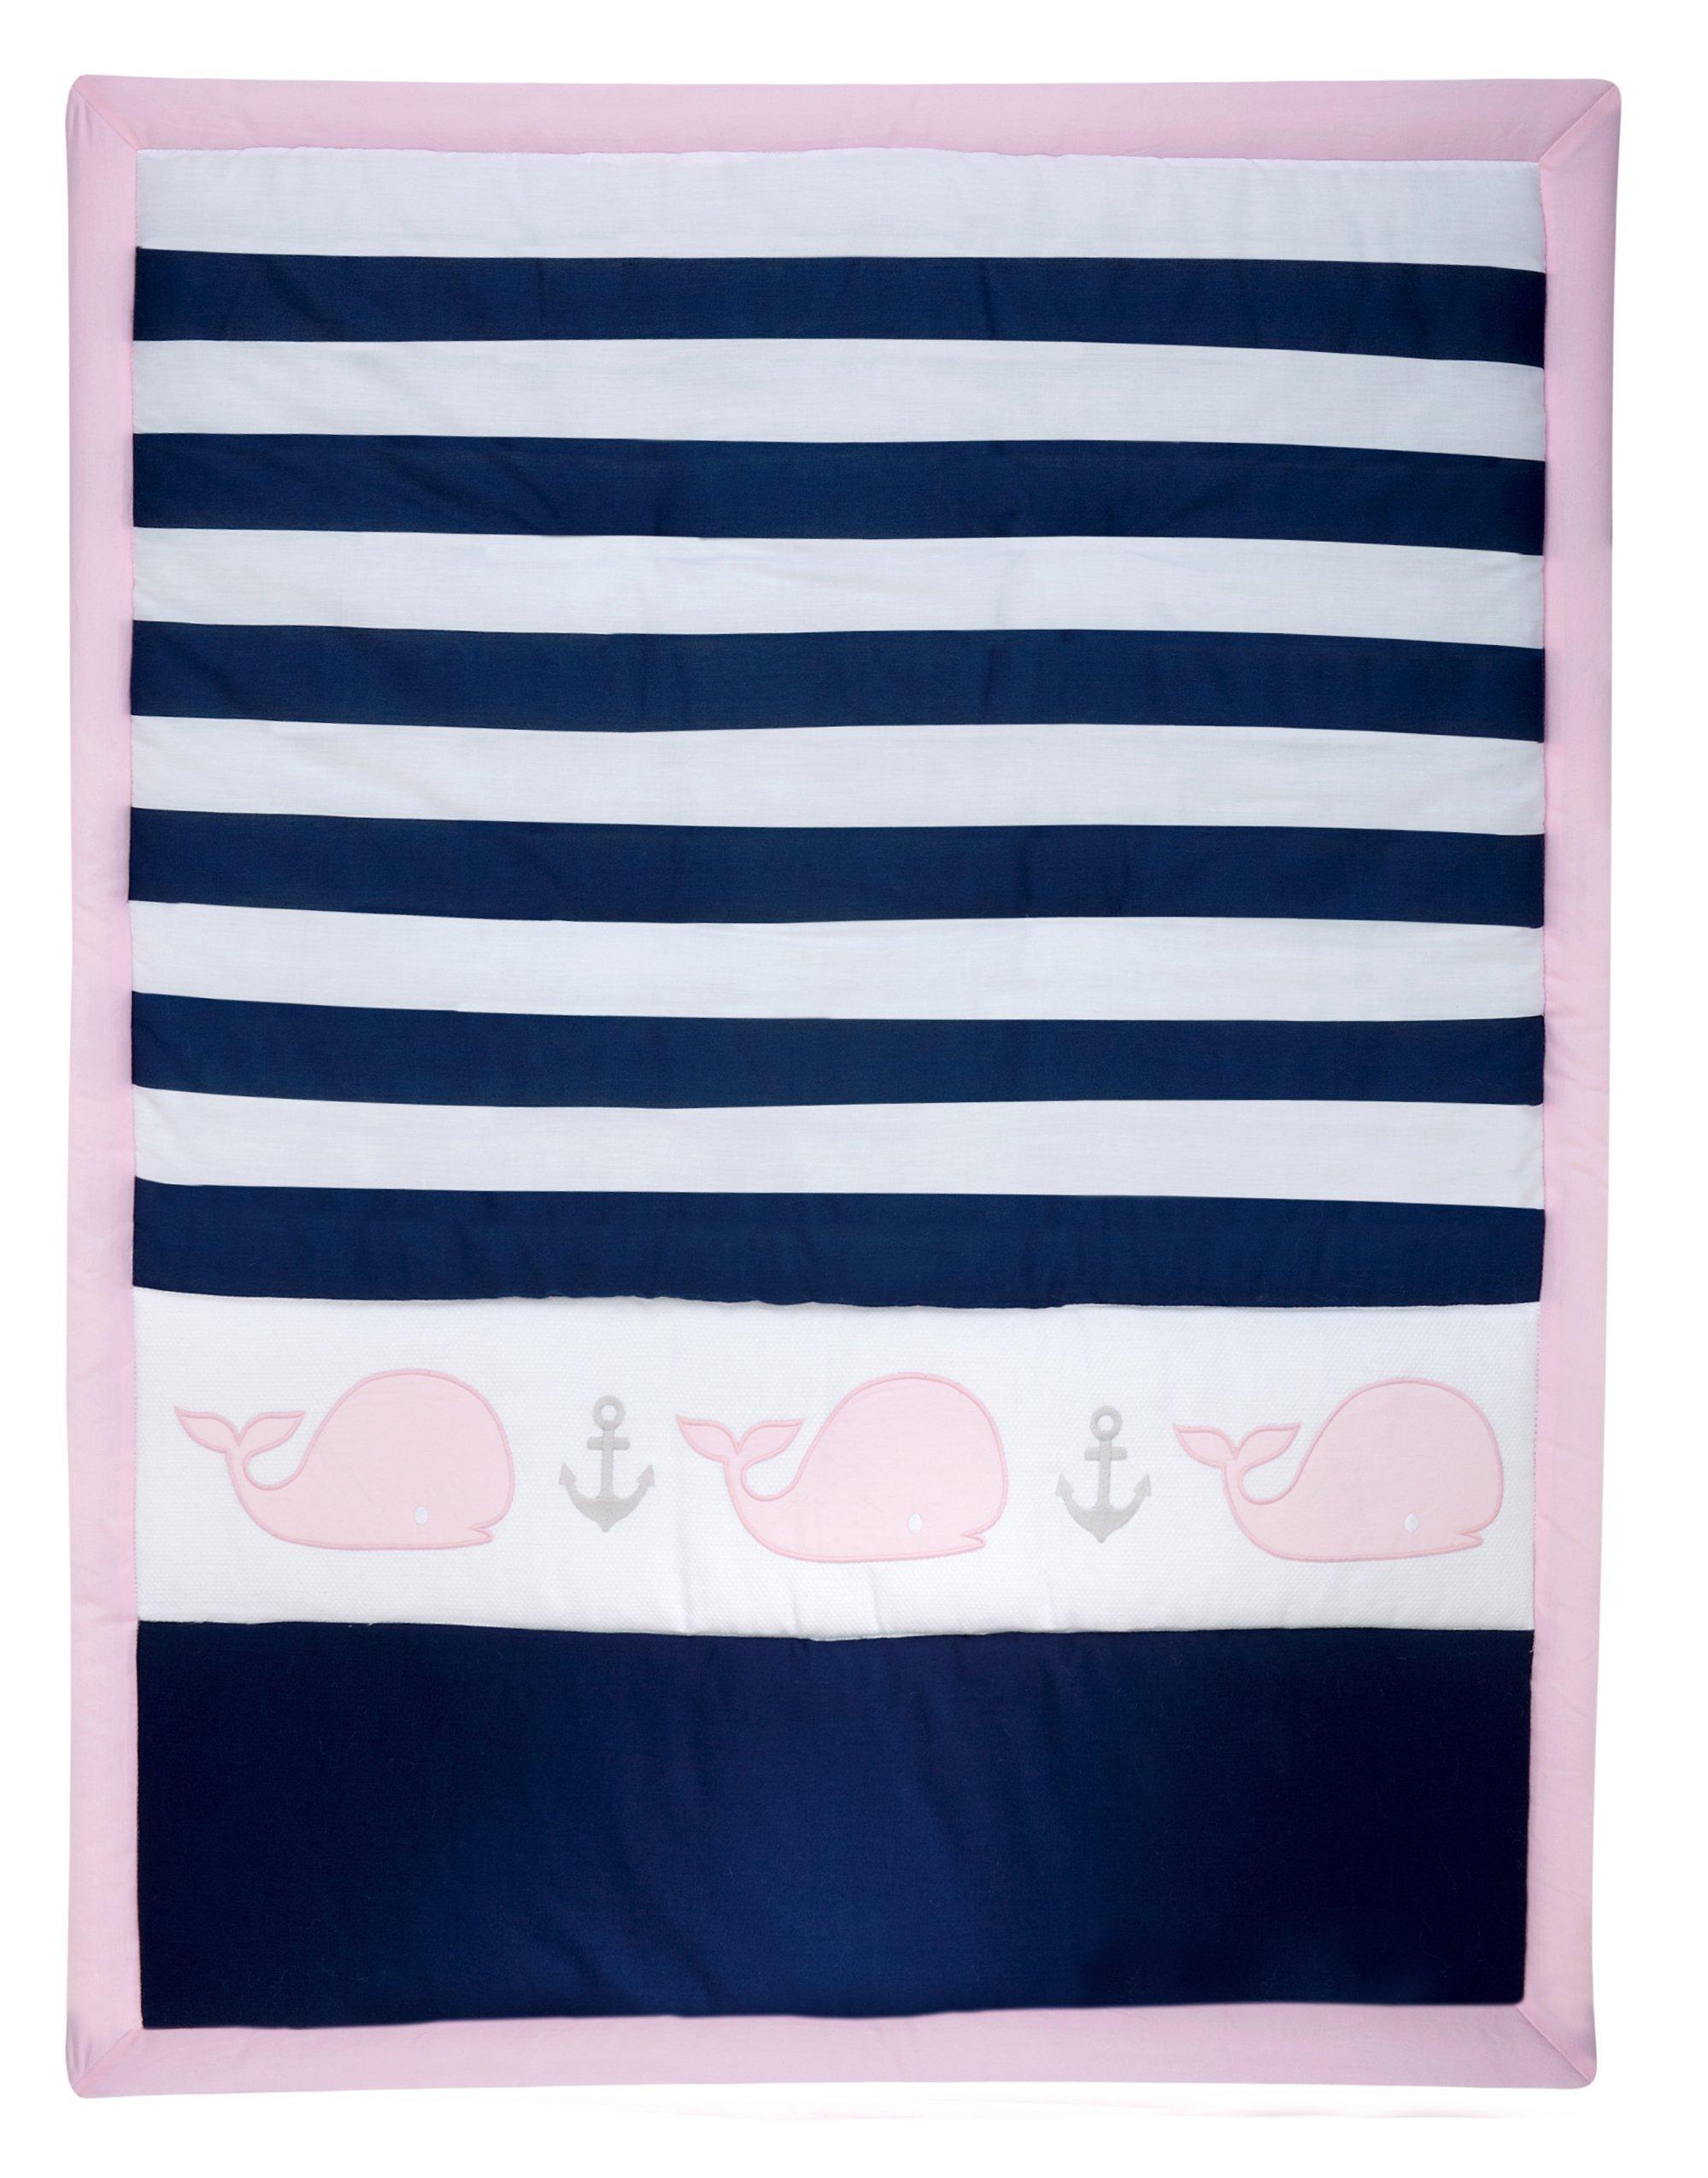 Nautica Kids Nursery Separates Comforter, Pink, Navy, White by Nautica